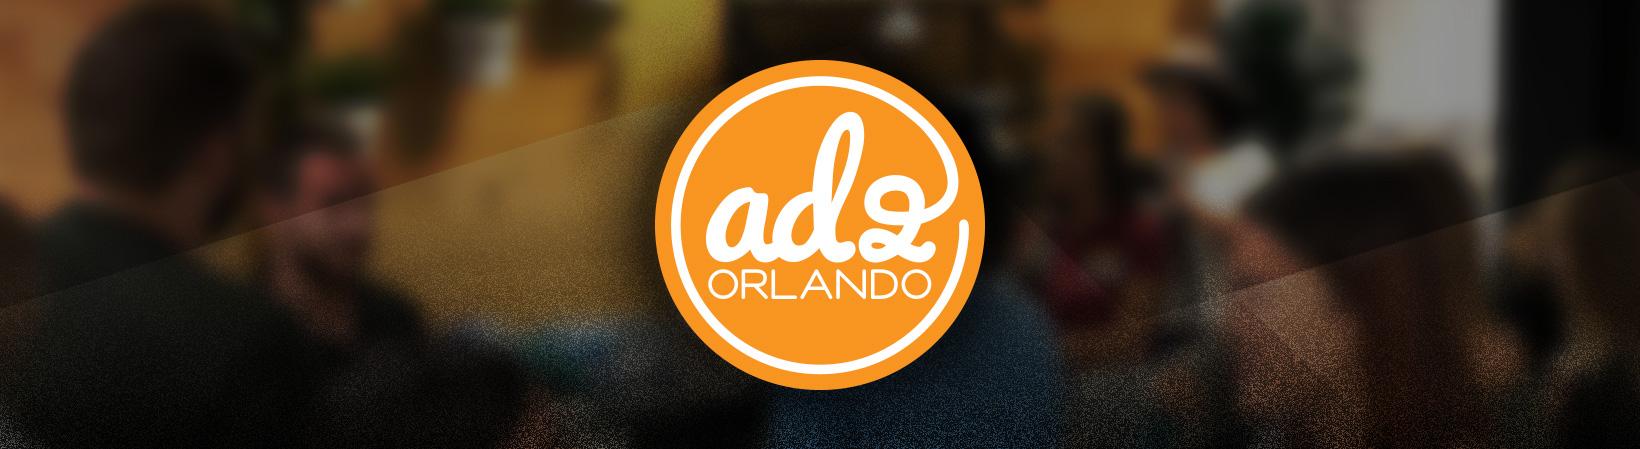 Ad 2 Orlando